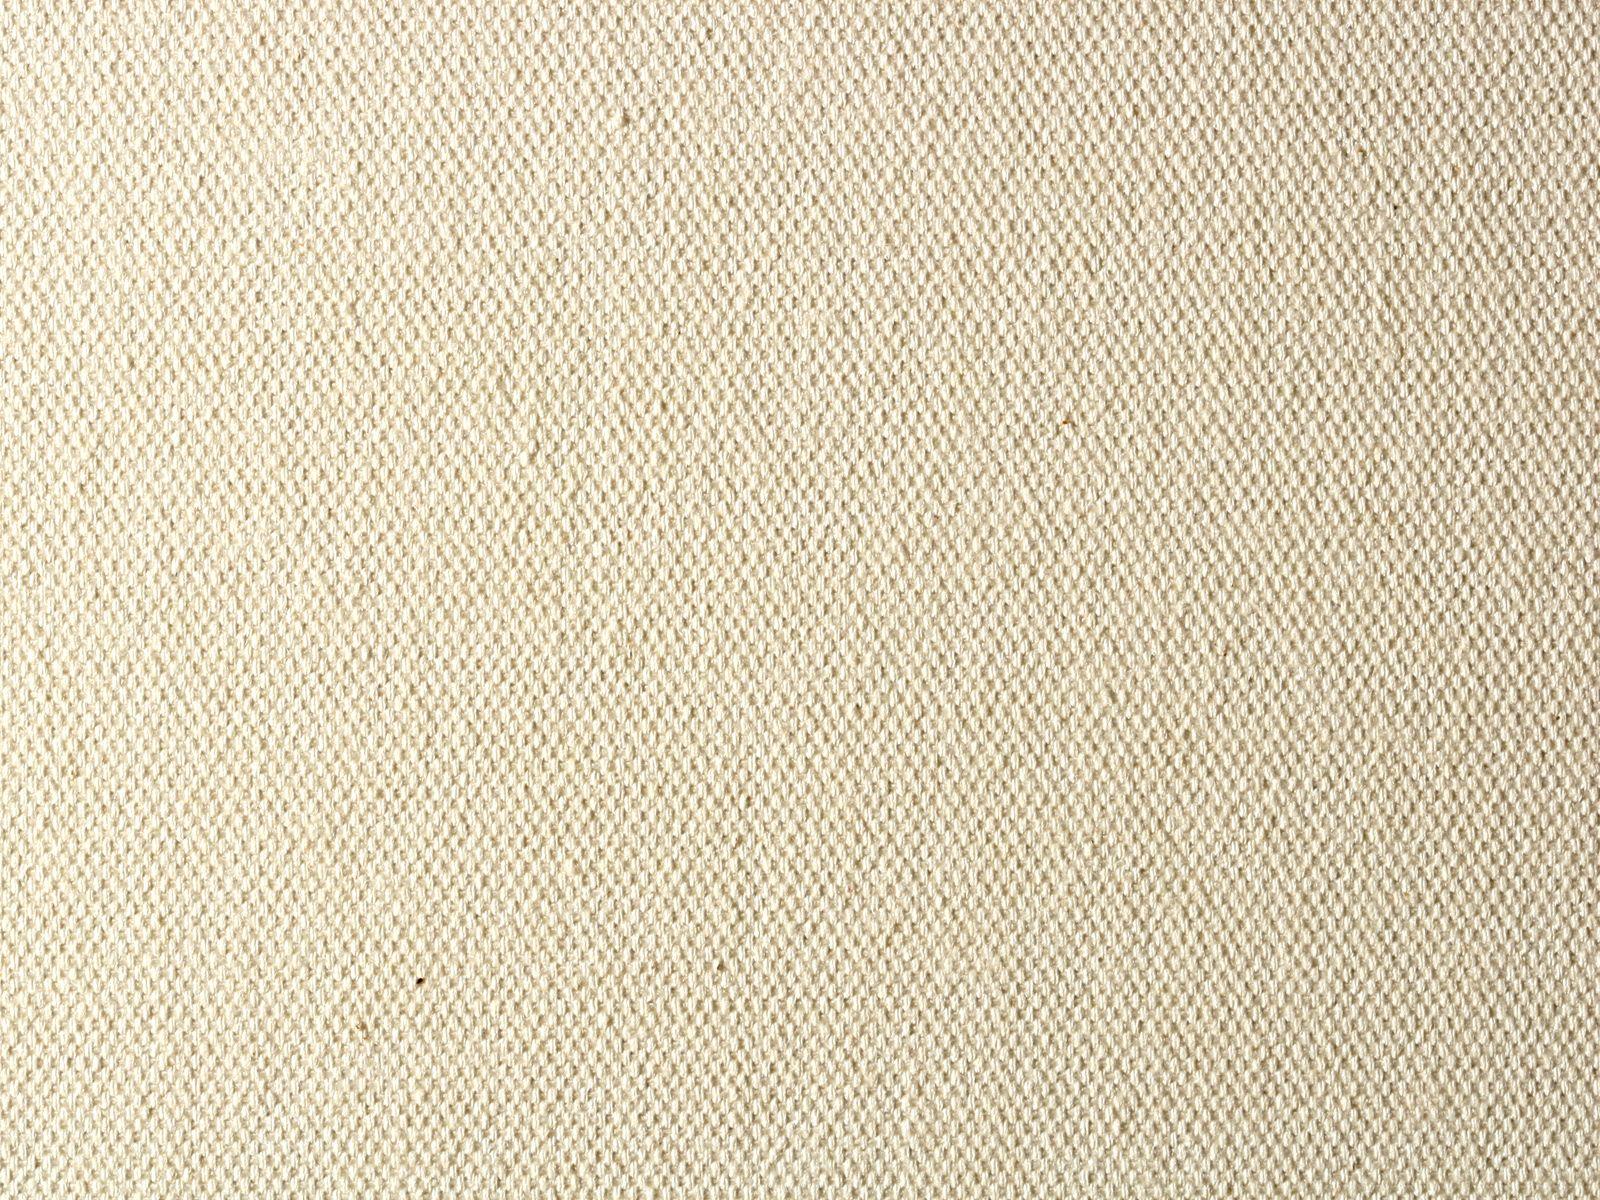 White Canvas Texture Backgrounds Jpg Canvas Texture Canvas